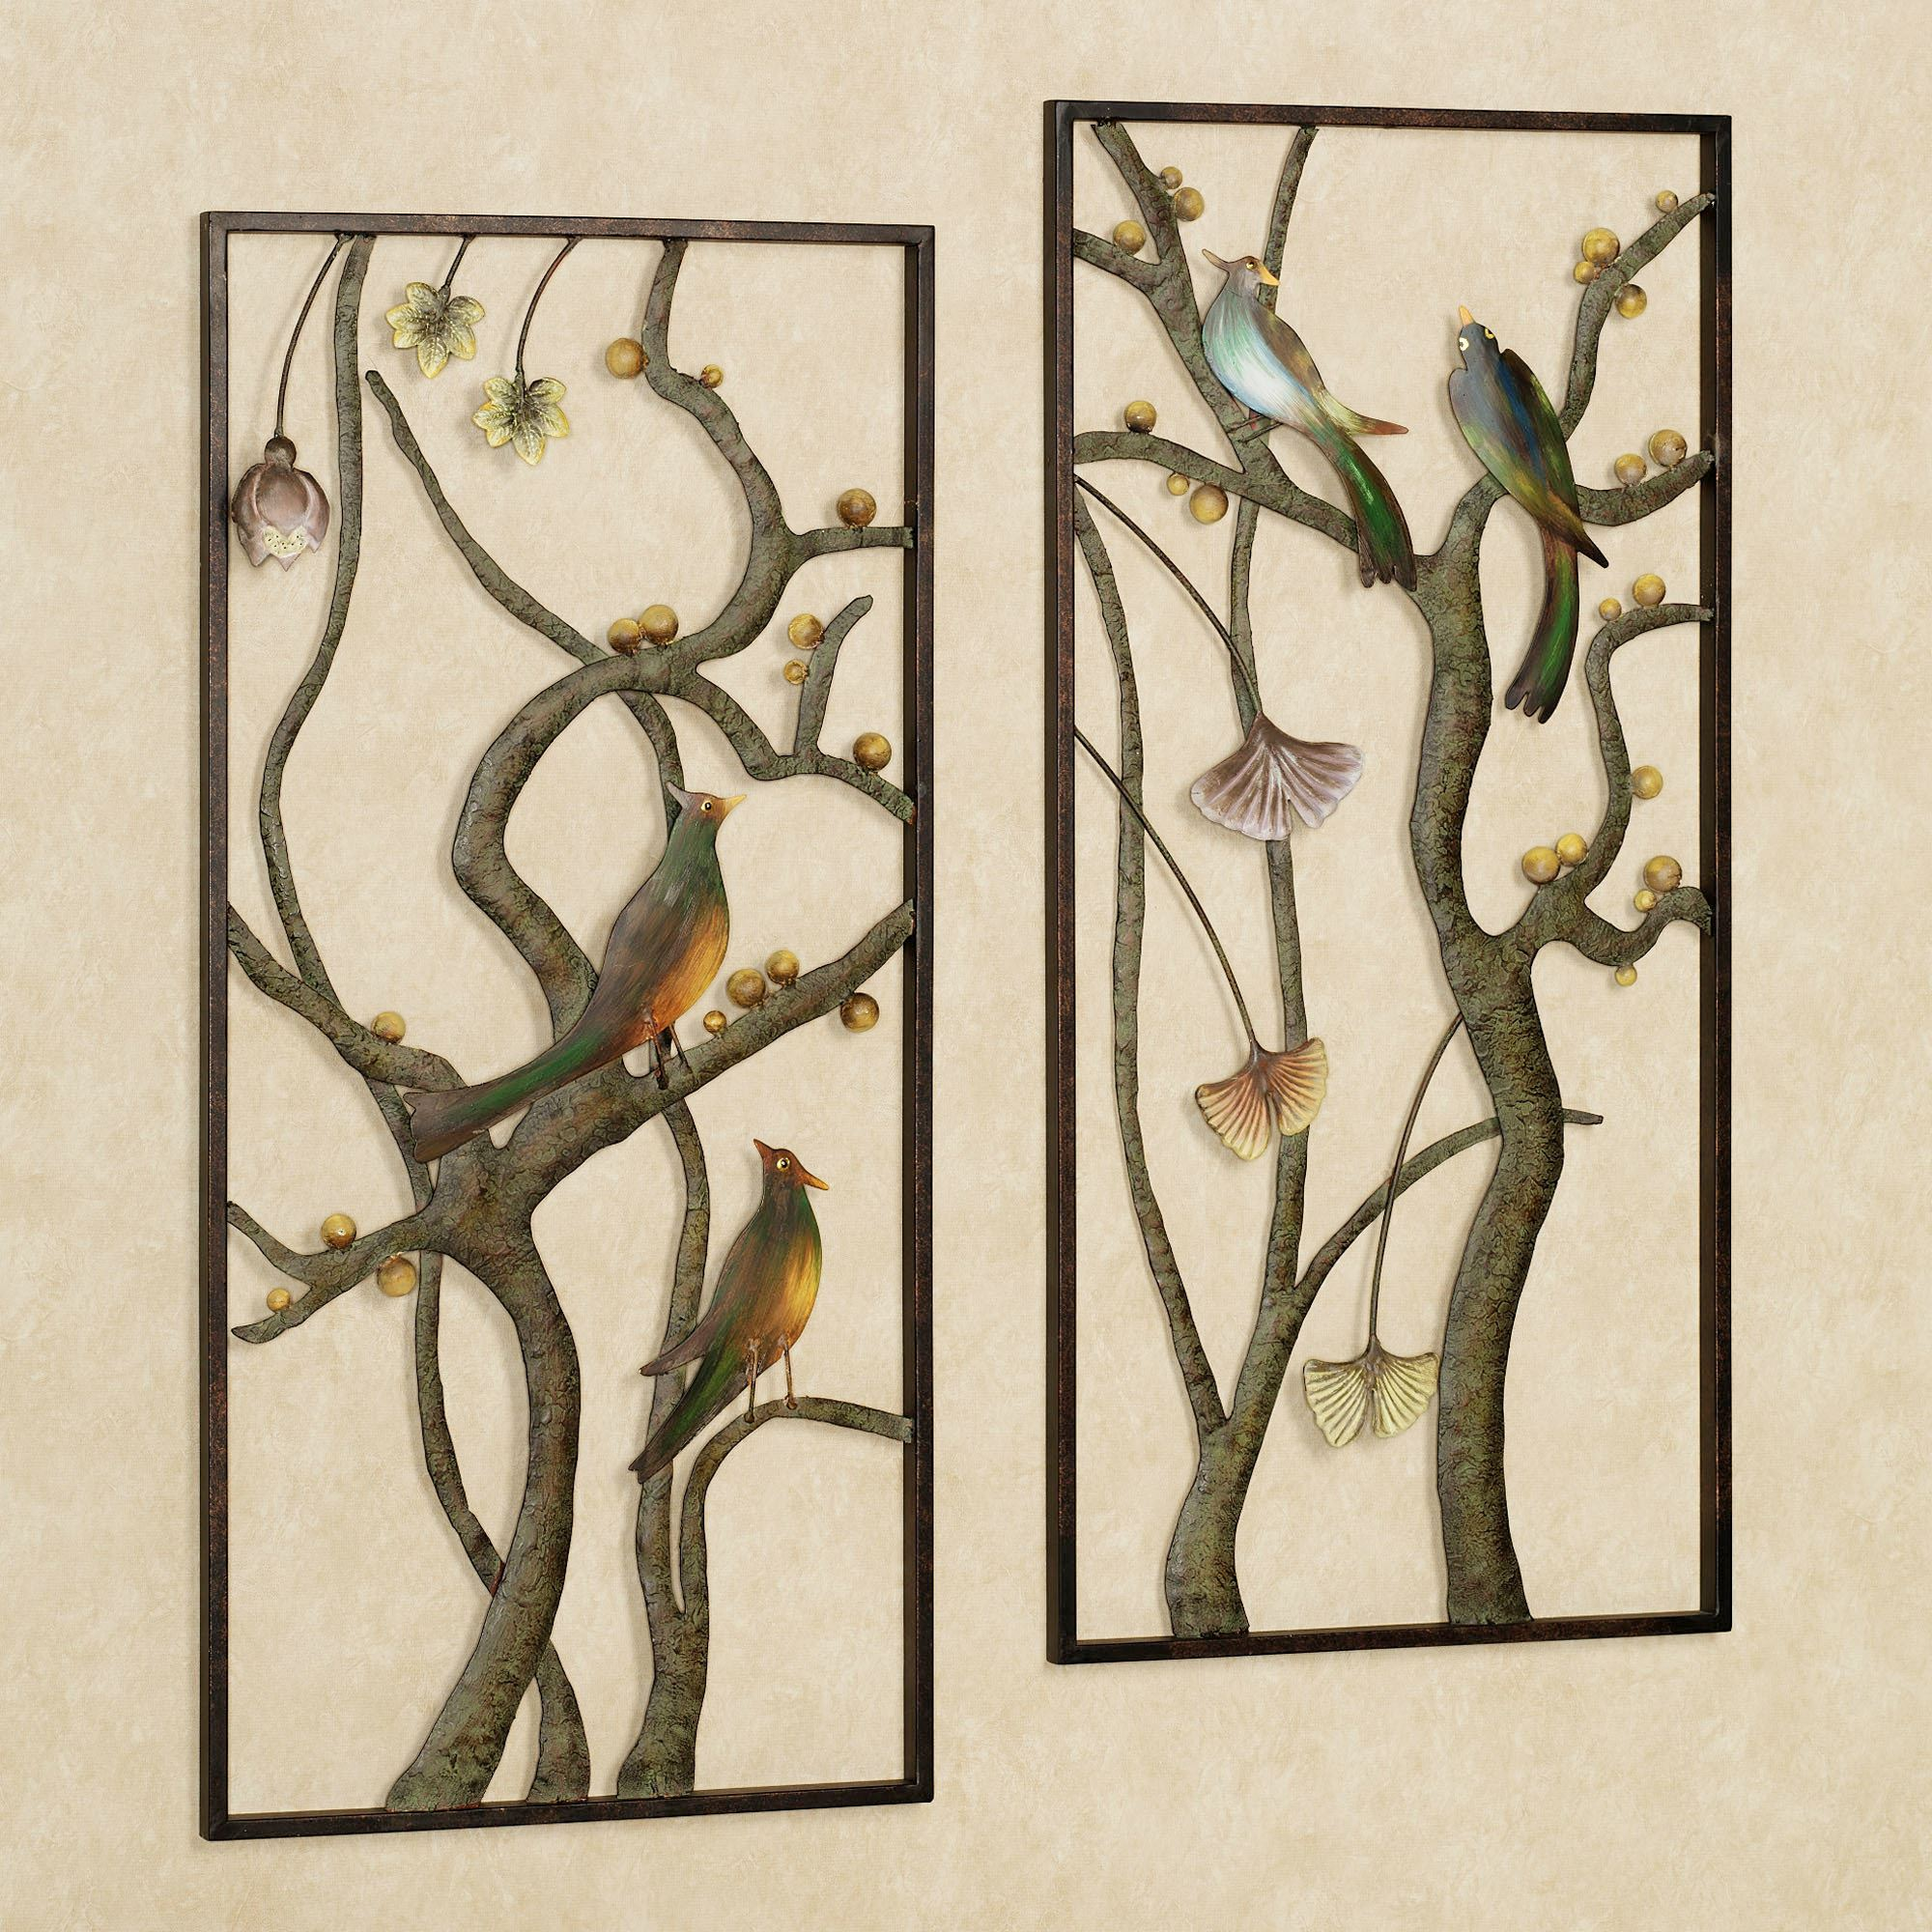 Asian garden metal wall panel art set for Ready set decor reviews